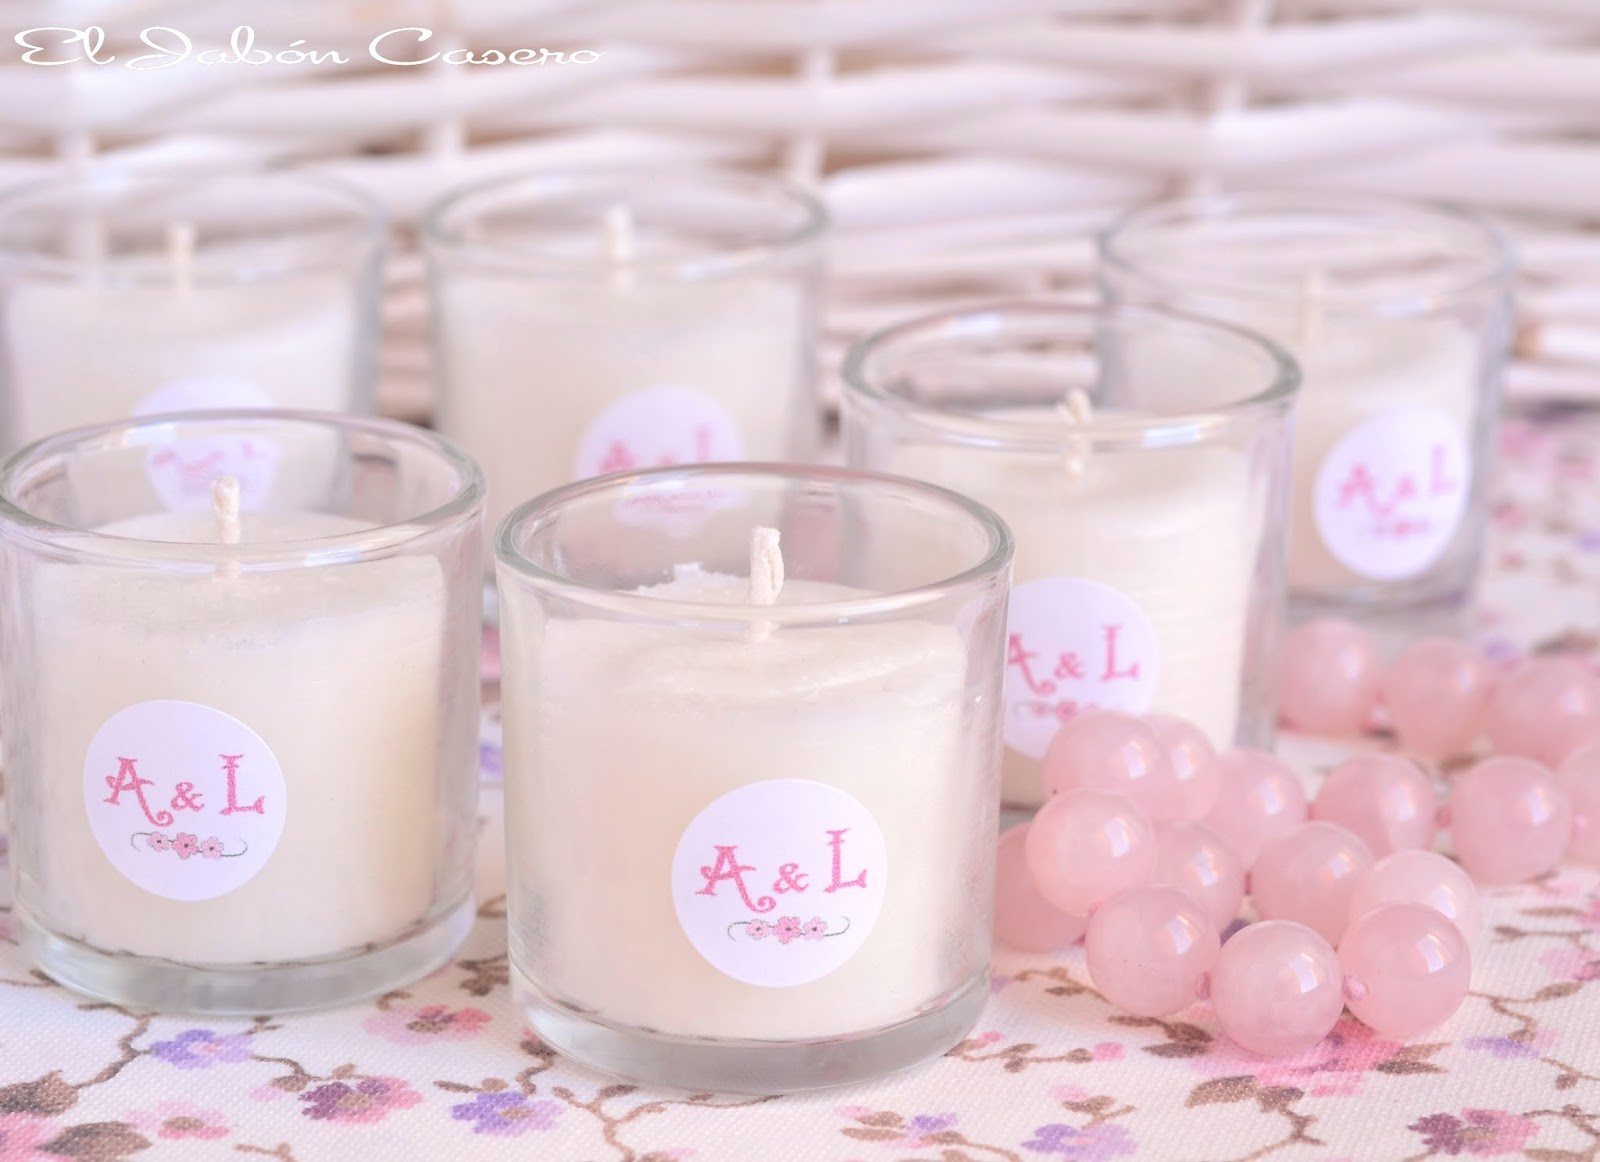 detalles personalizados de boda velas naturales